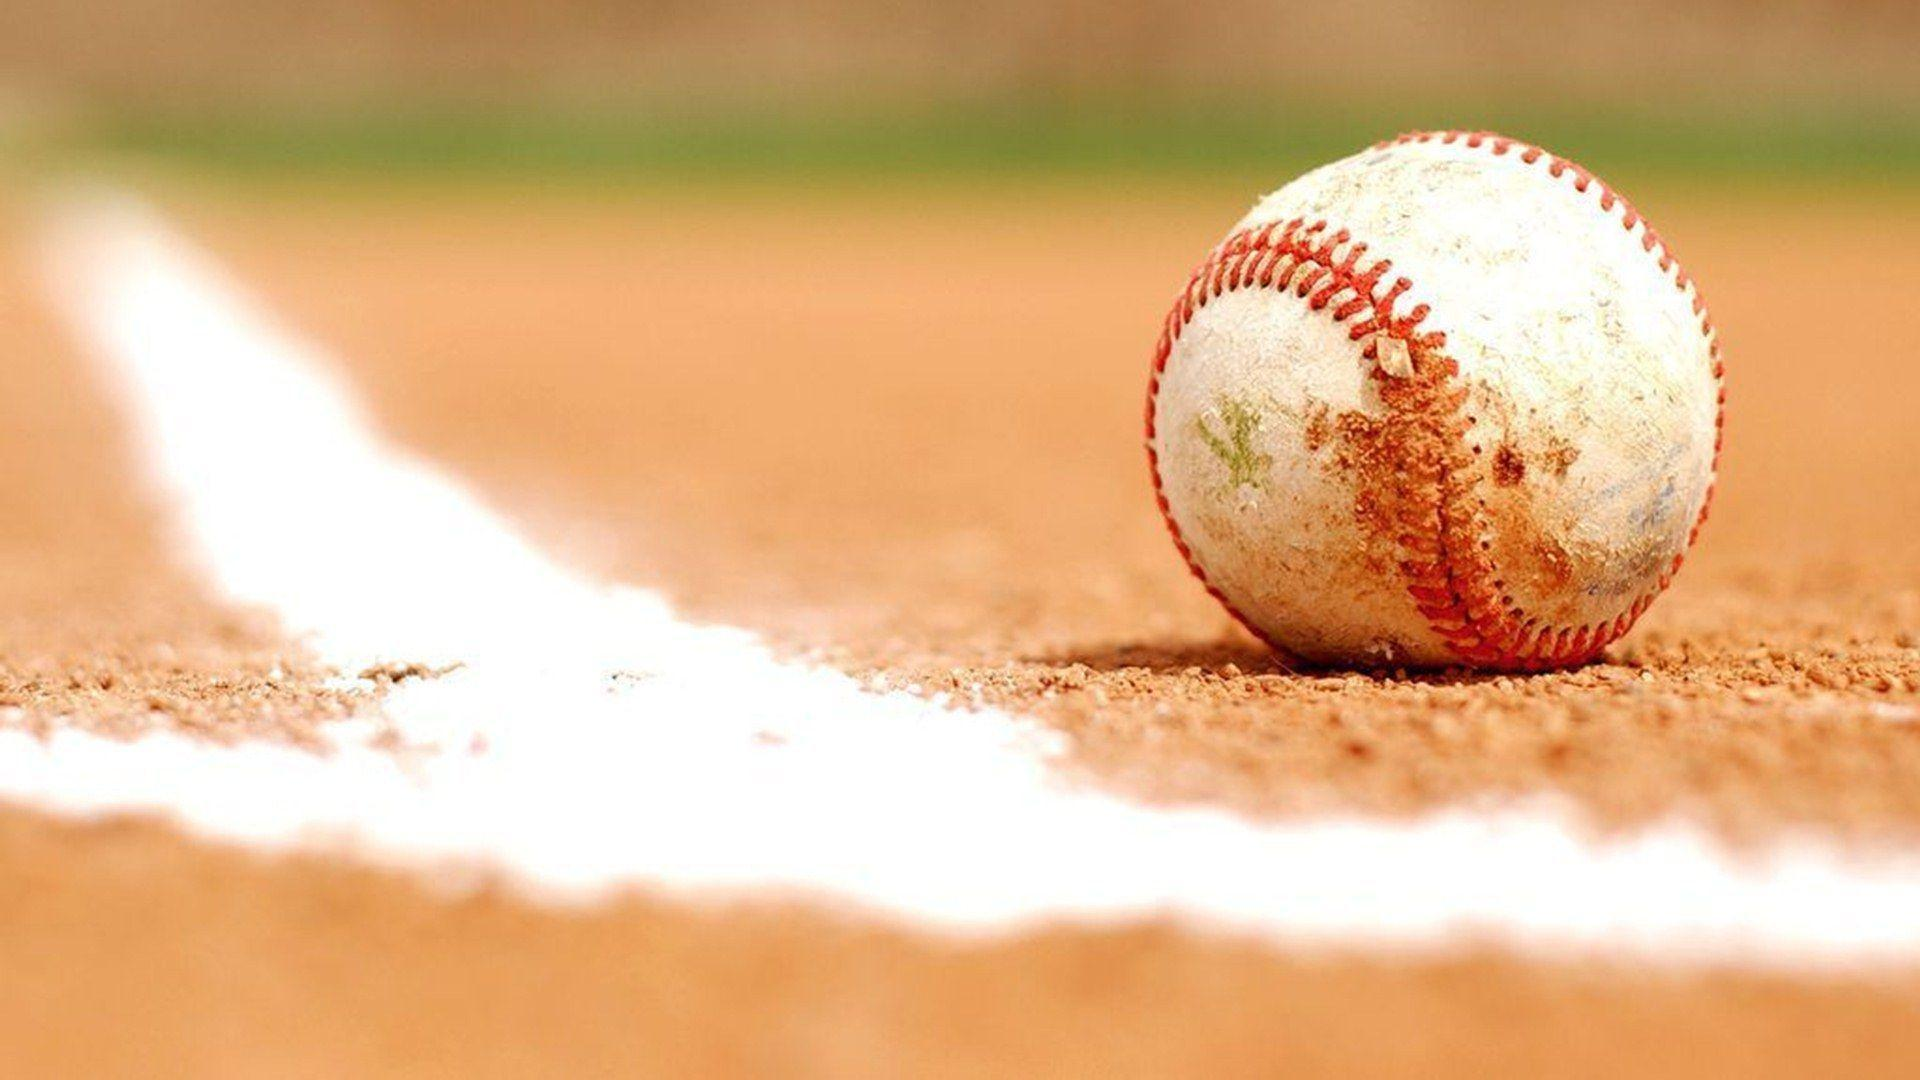 Baseball Backgrounds 1920x1080